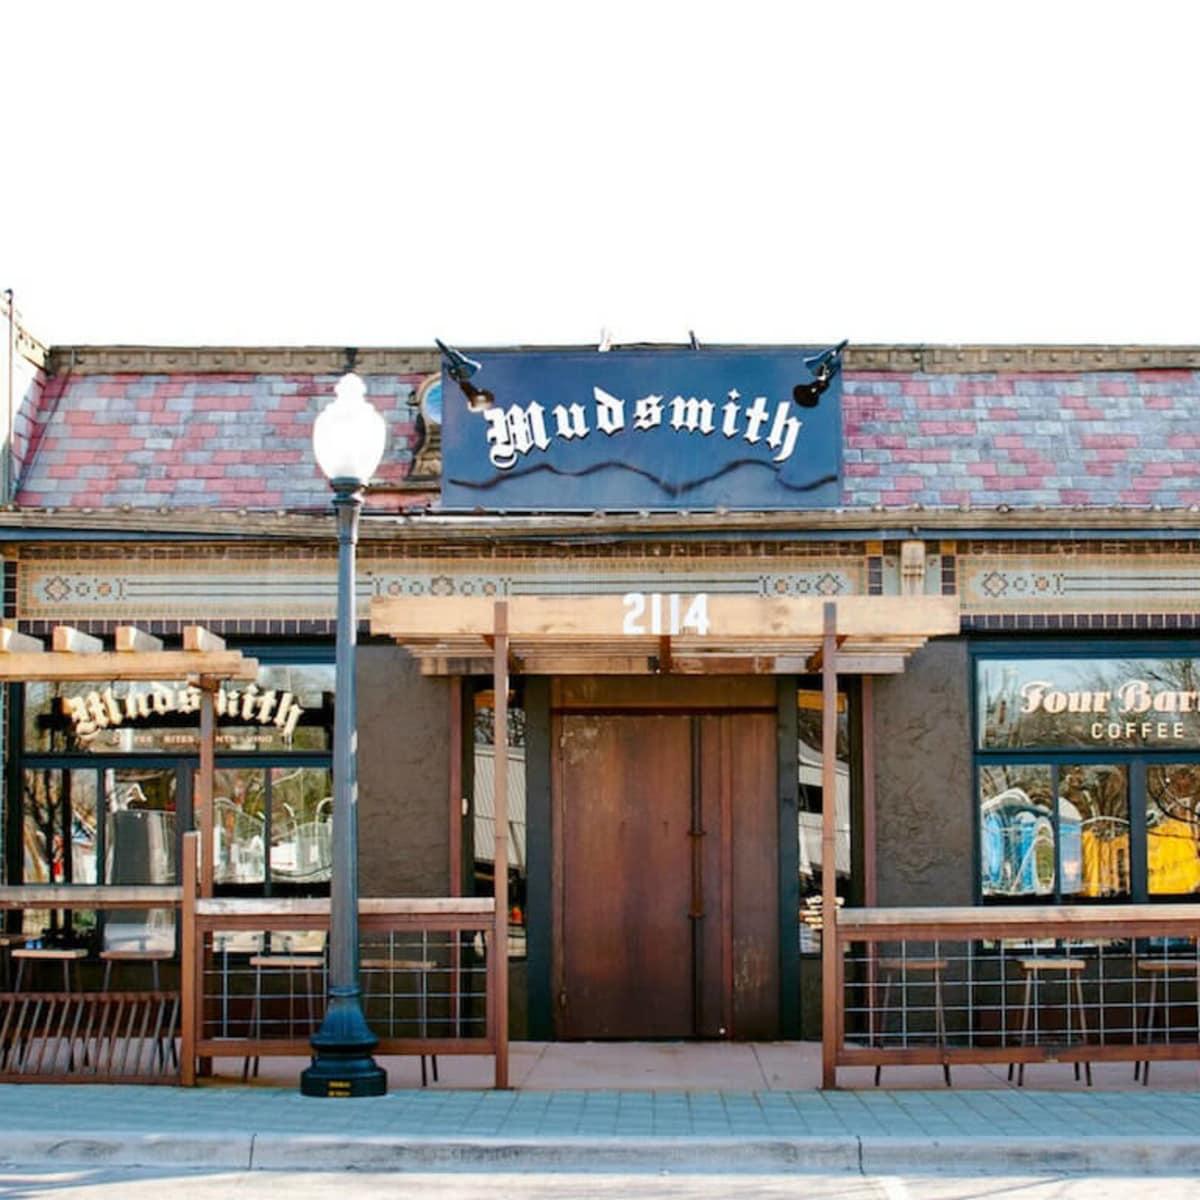 Mudsmith coffee shop in Dallas